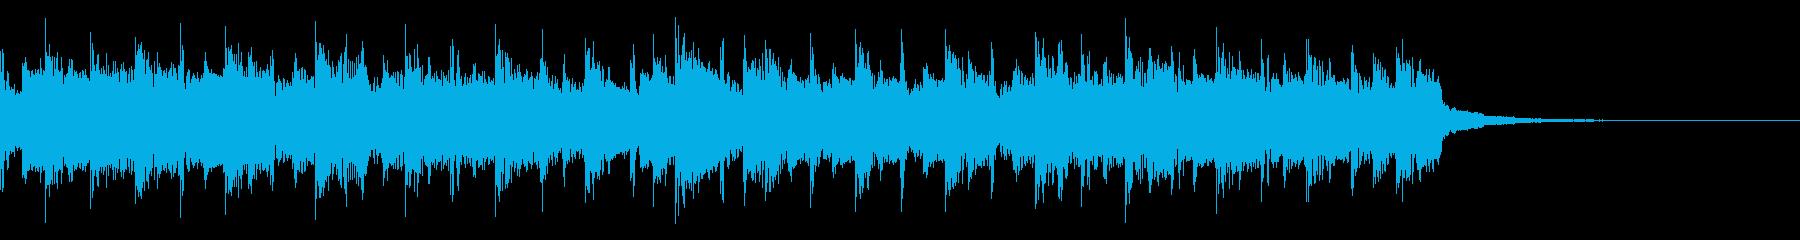 80'sなジングルの再生済みの波形